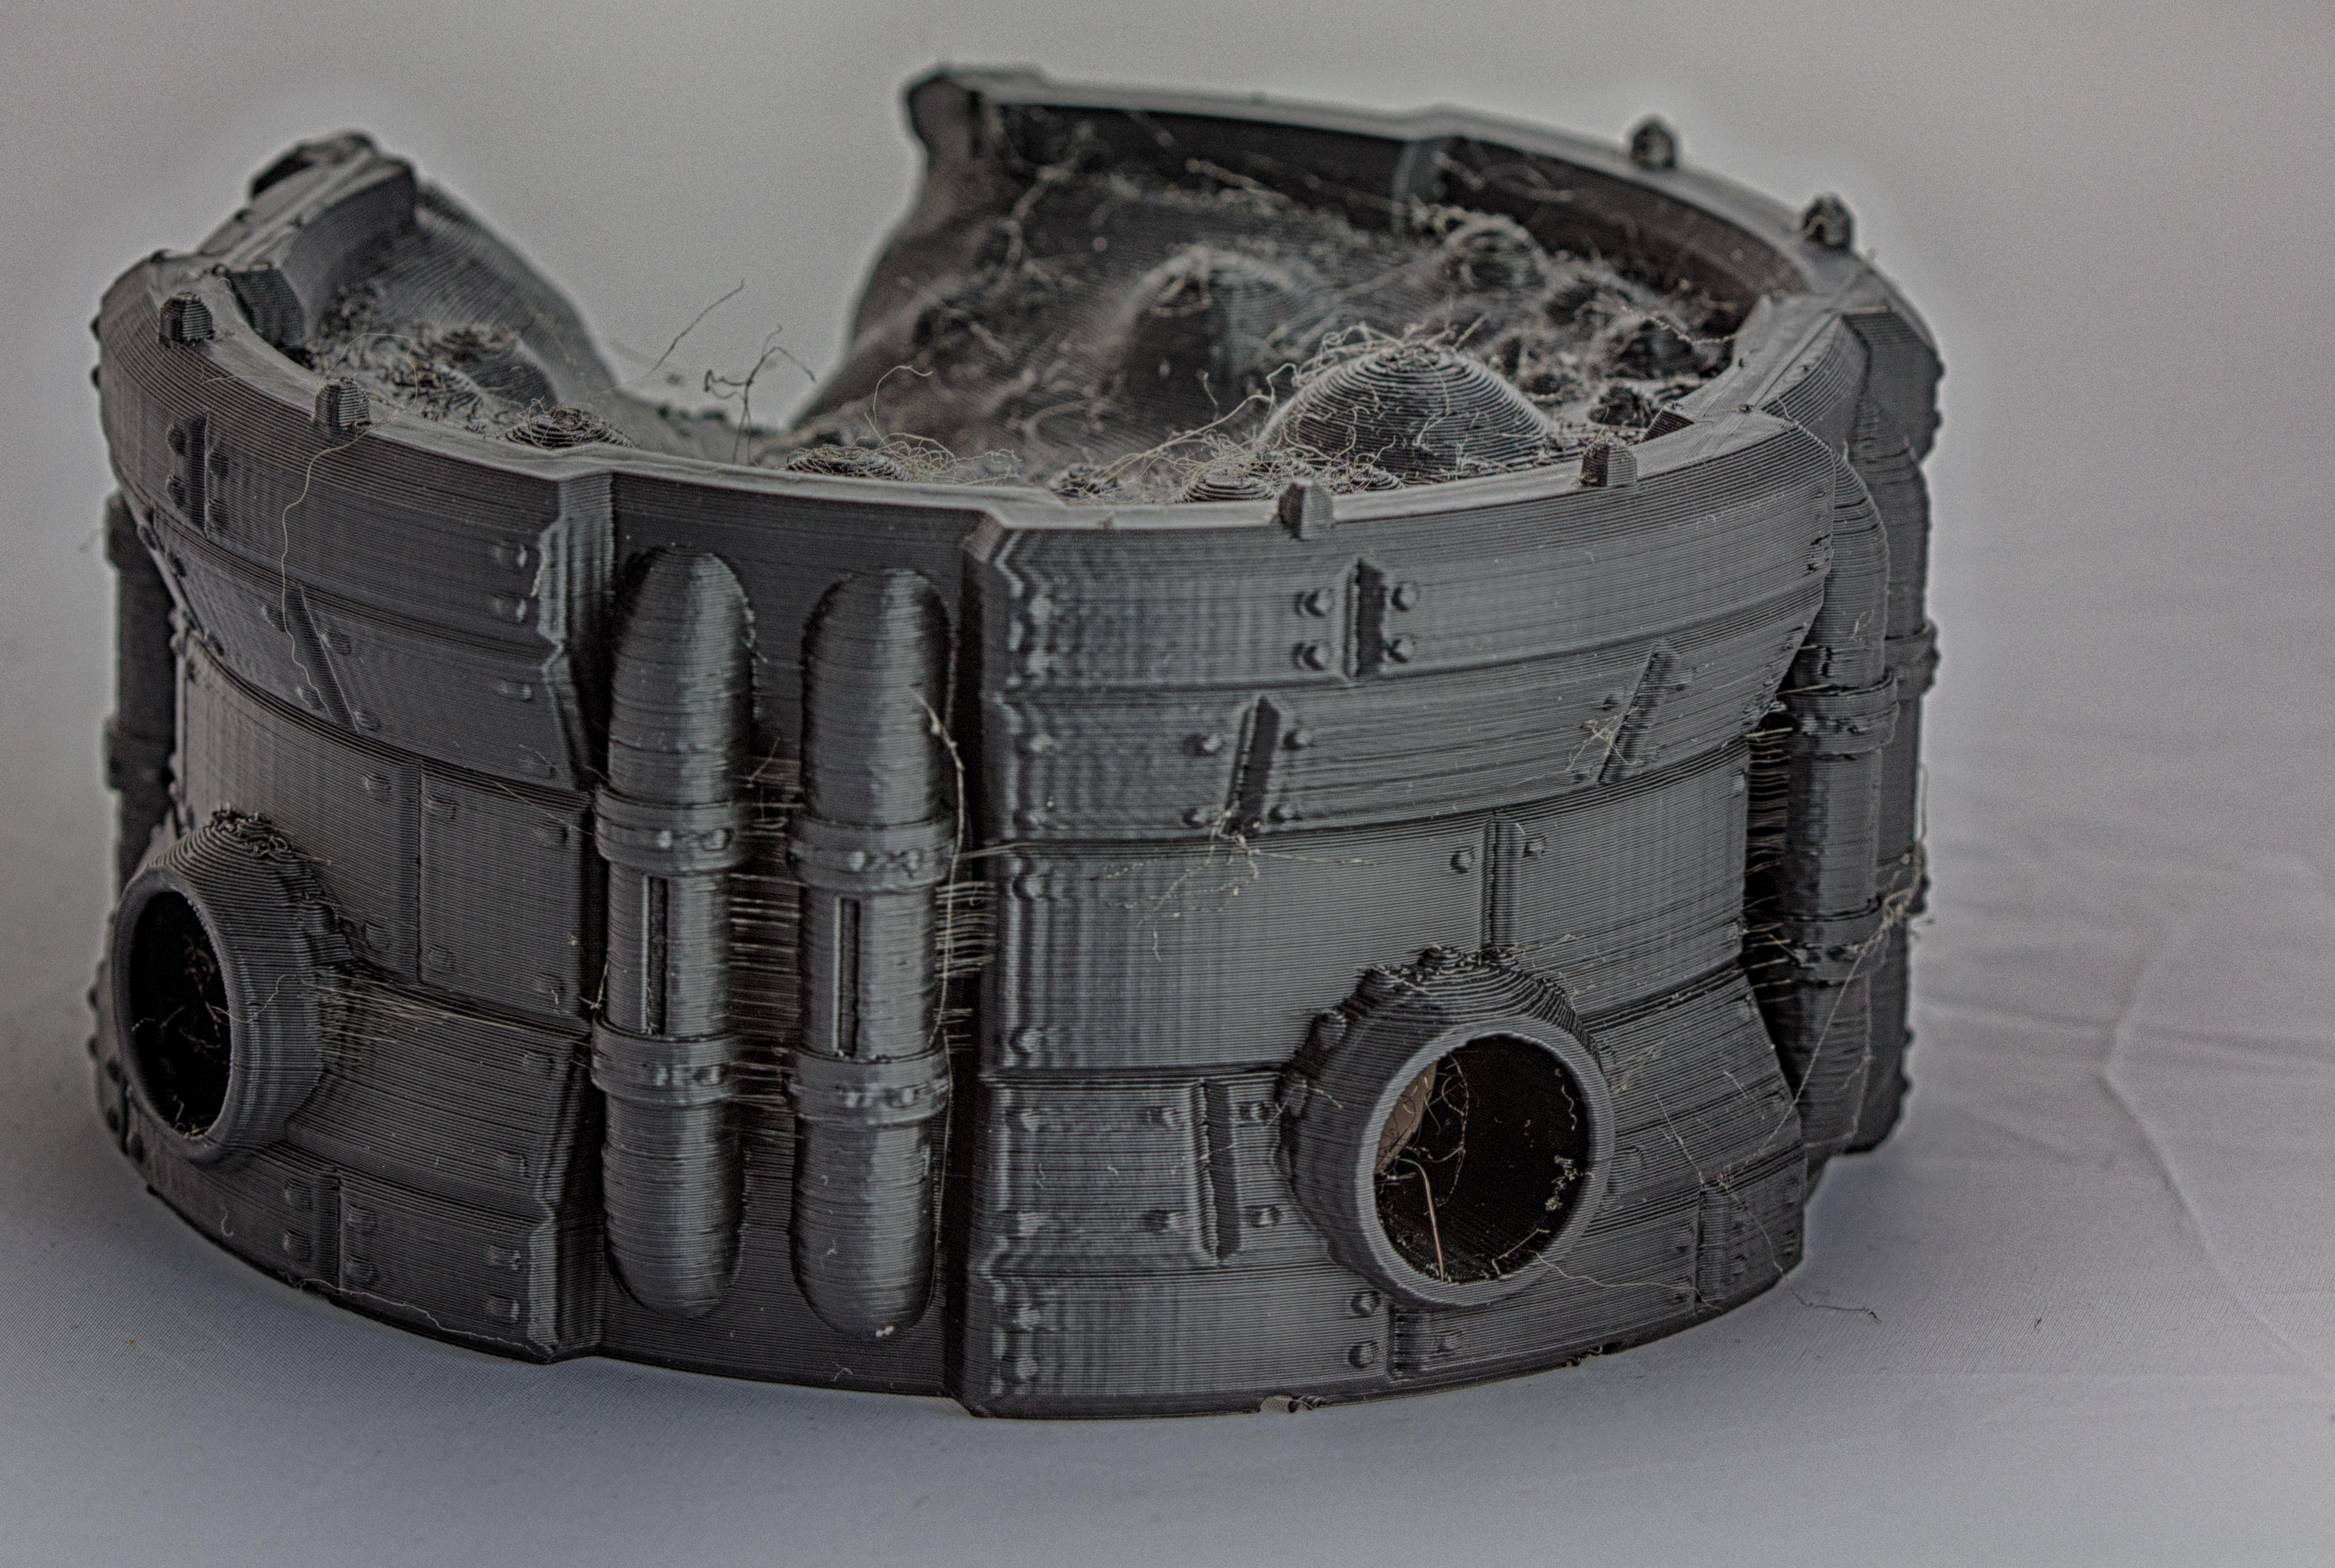 Wargame terrain - printed CR10s (8 of 10)